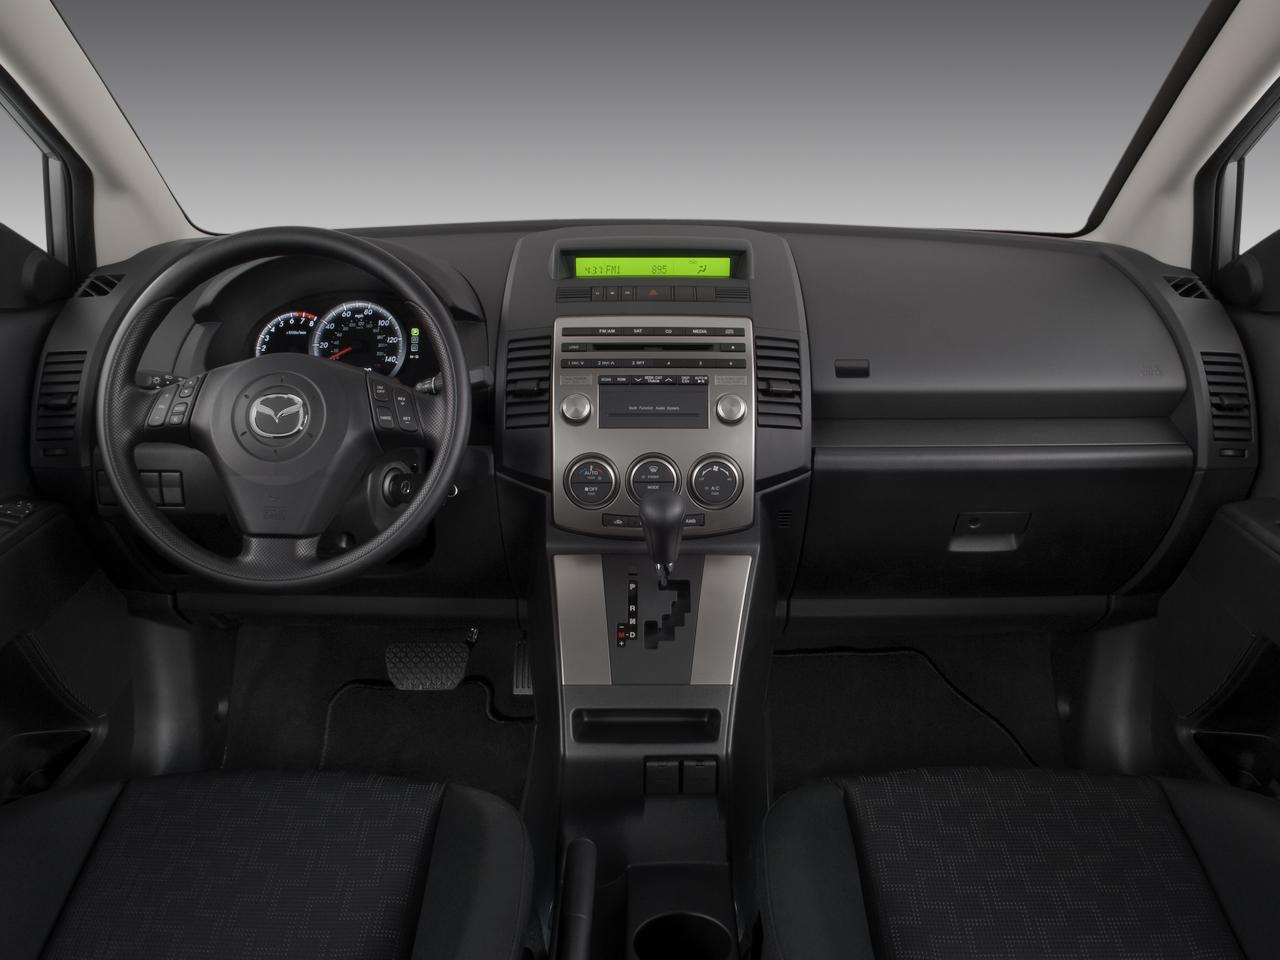 http://st.automobilemag.com/uploads/sites/10/2015/11/2008-mazda-mazda5-sport-wagon-dashboard.png